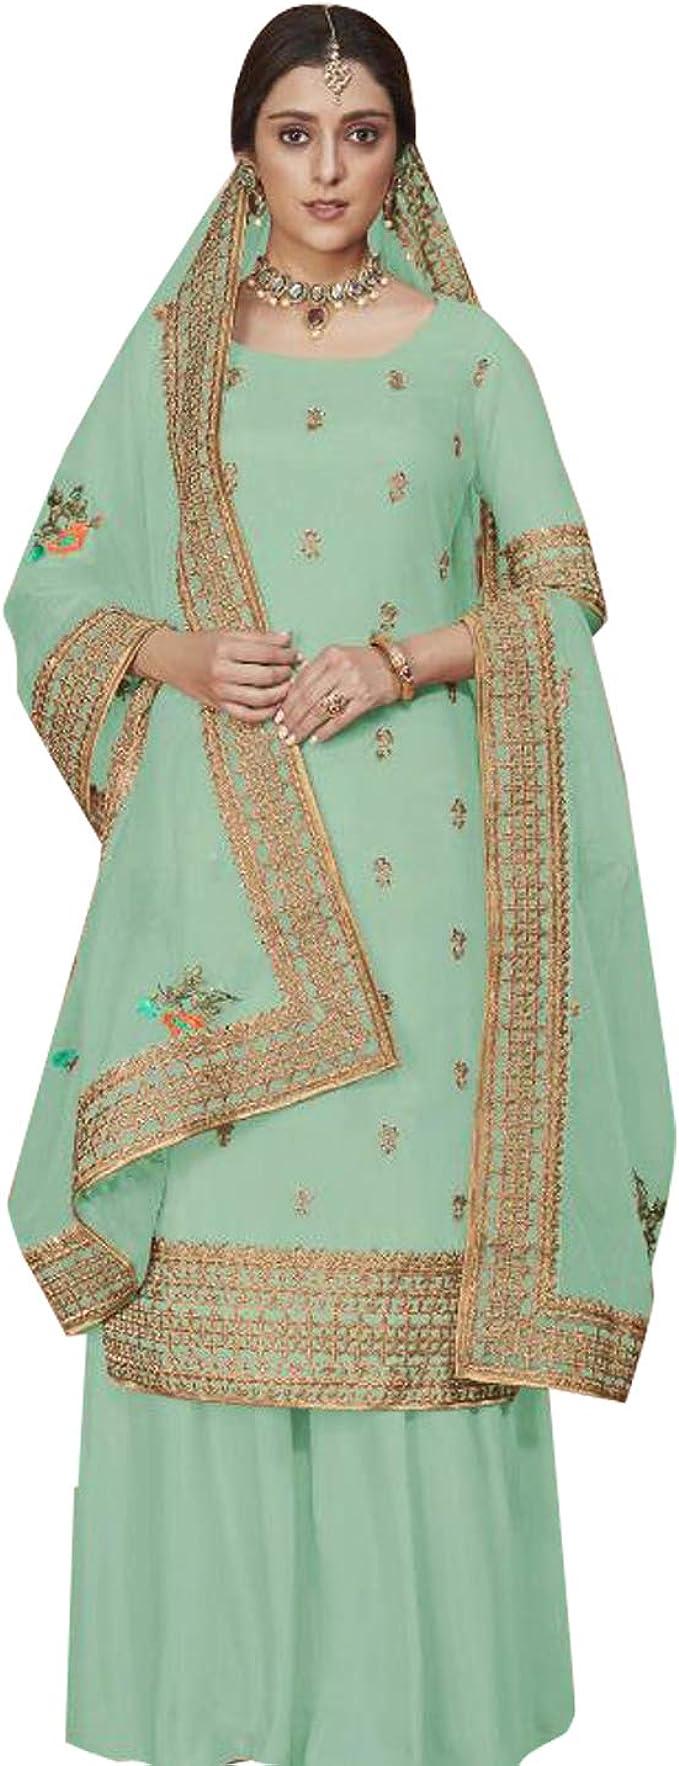 Women Designer Pakistani Sharara Salwar Kameez Bollywood Stylish Palazzo Kurta